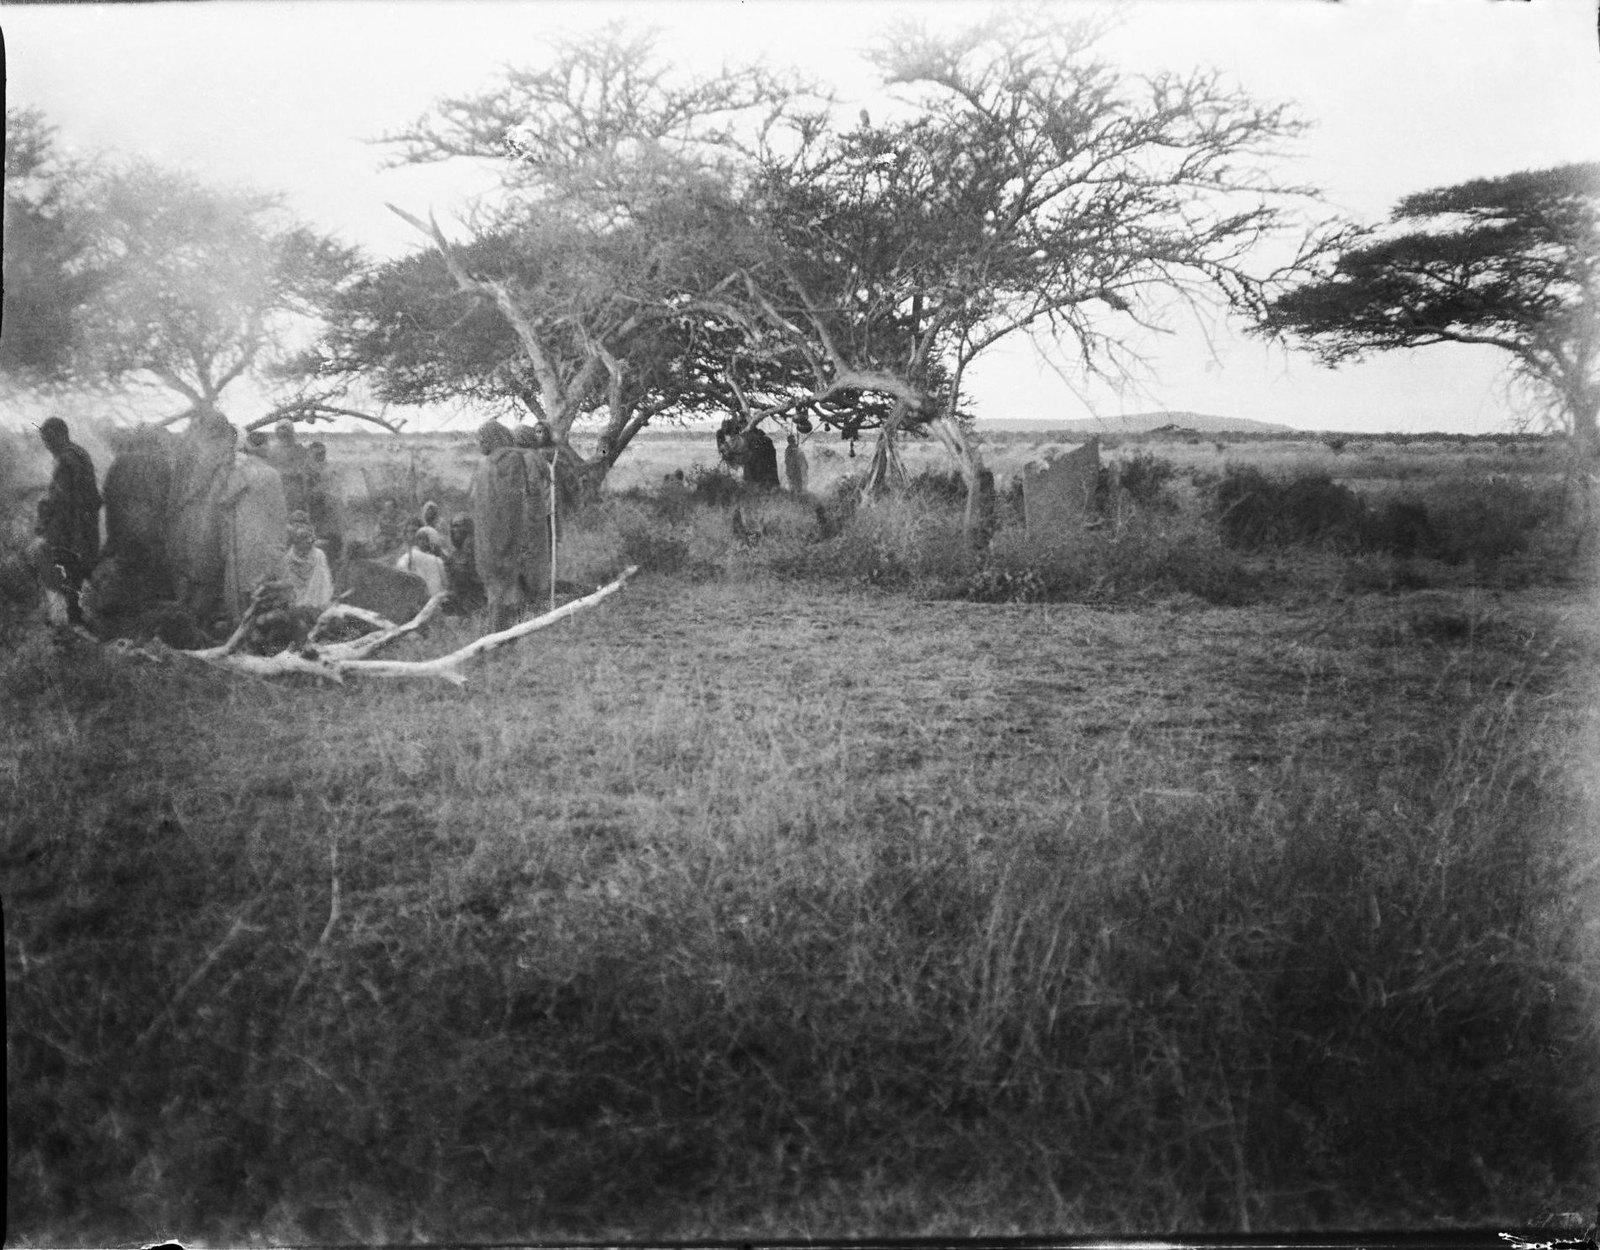 10. Хараре. Представители народа оромо на кладбище